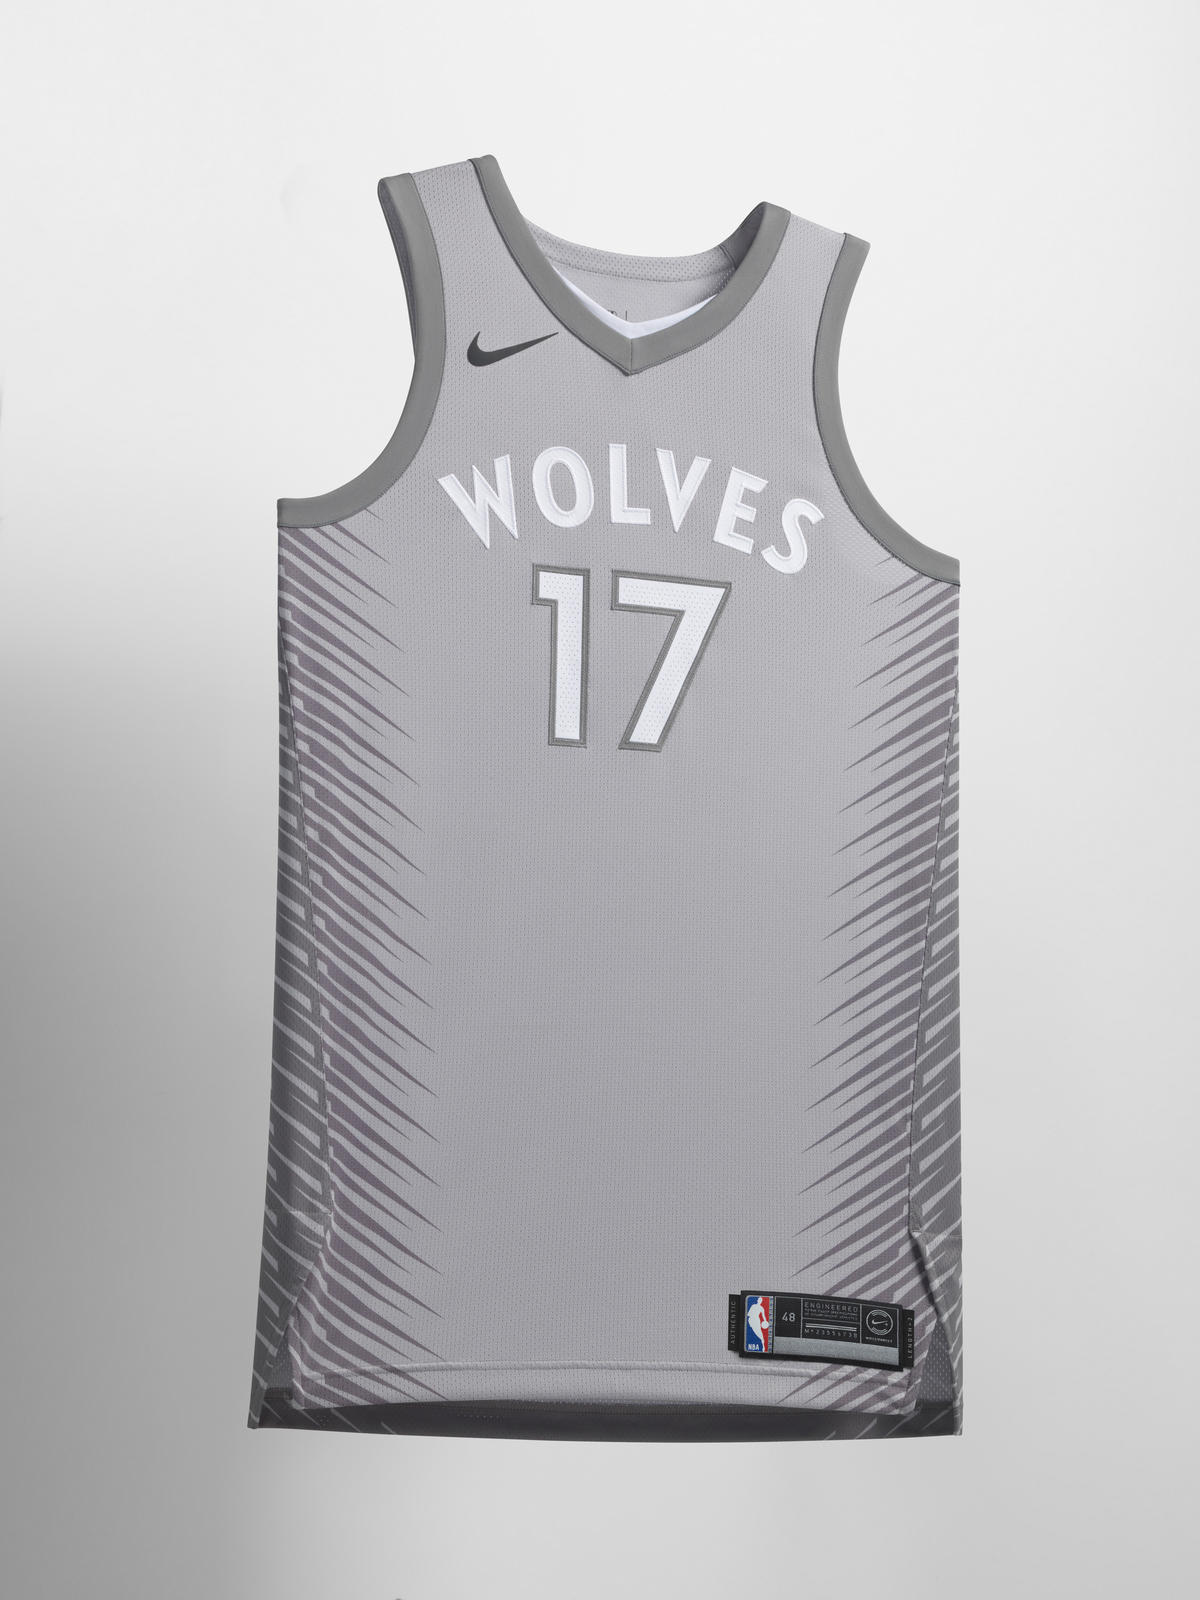 Nike_NBA_City_Edition_Uniform_Minnesota_Timberwolves_0141_native_1600